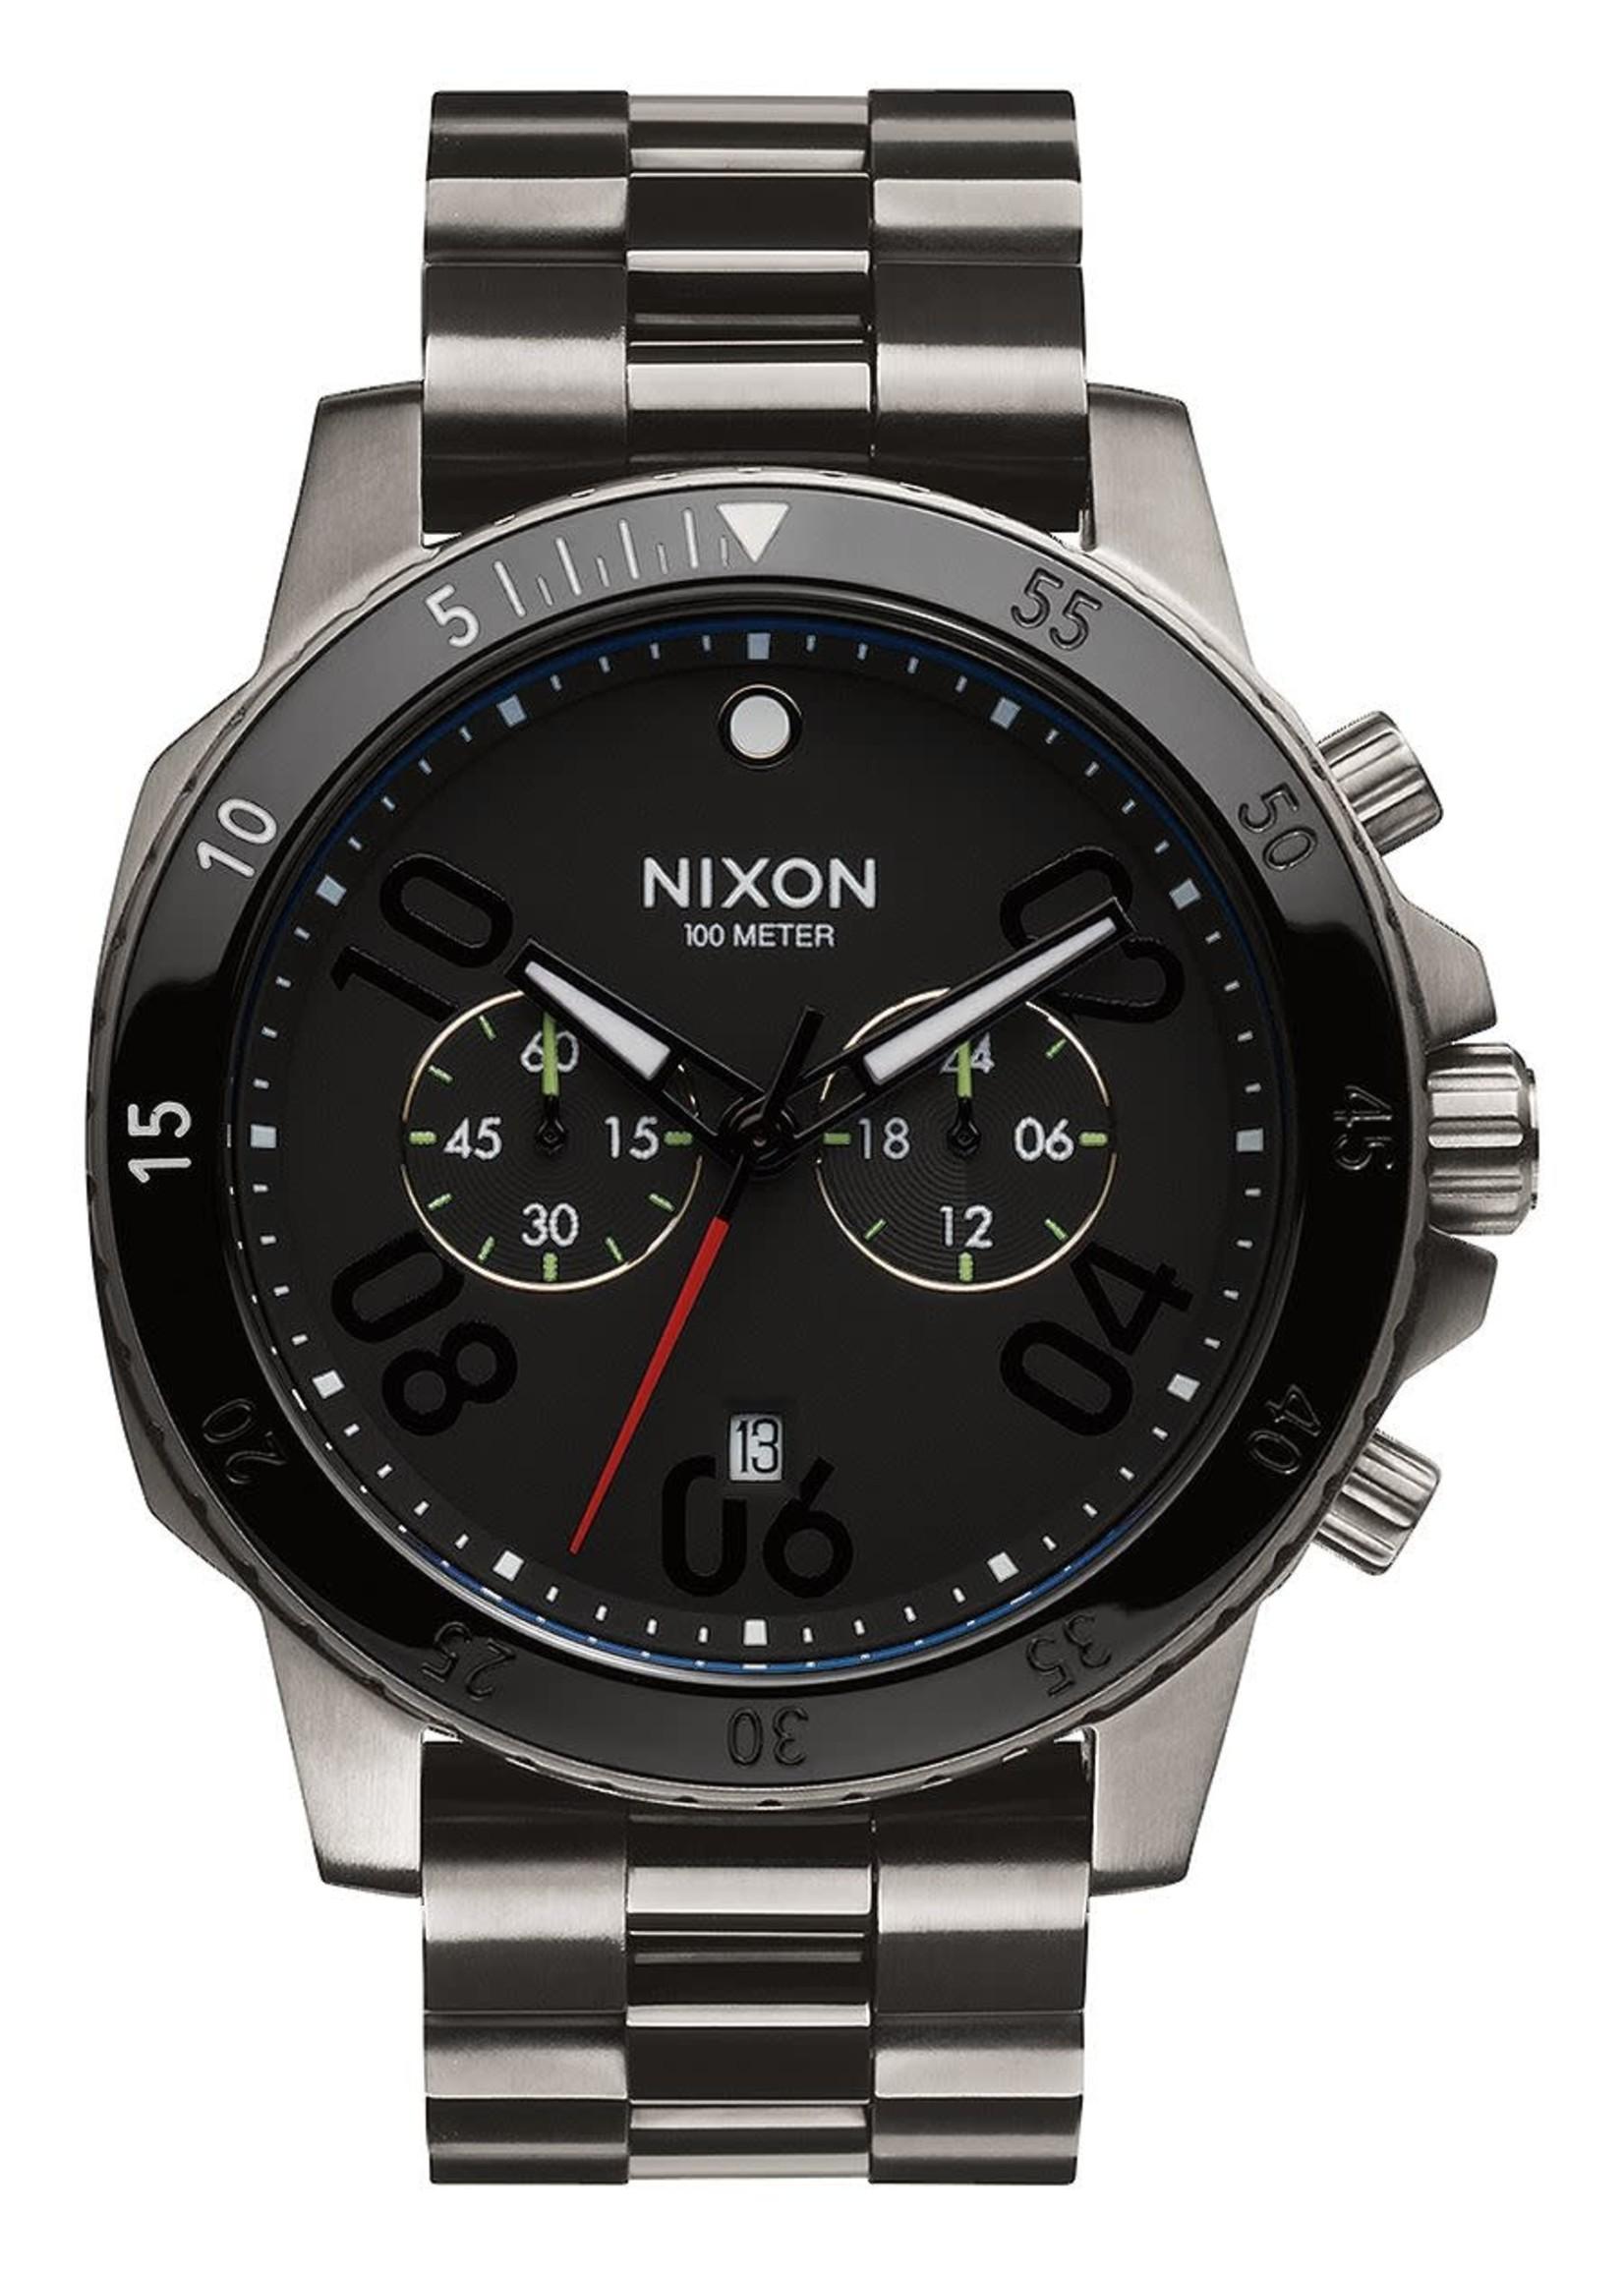 NIXON Nixon Ranger Chrono SALE 40% off